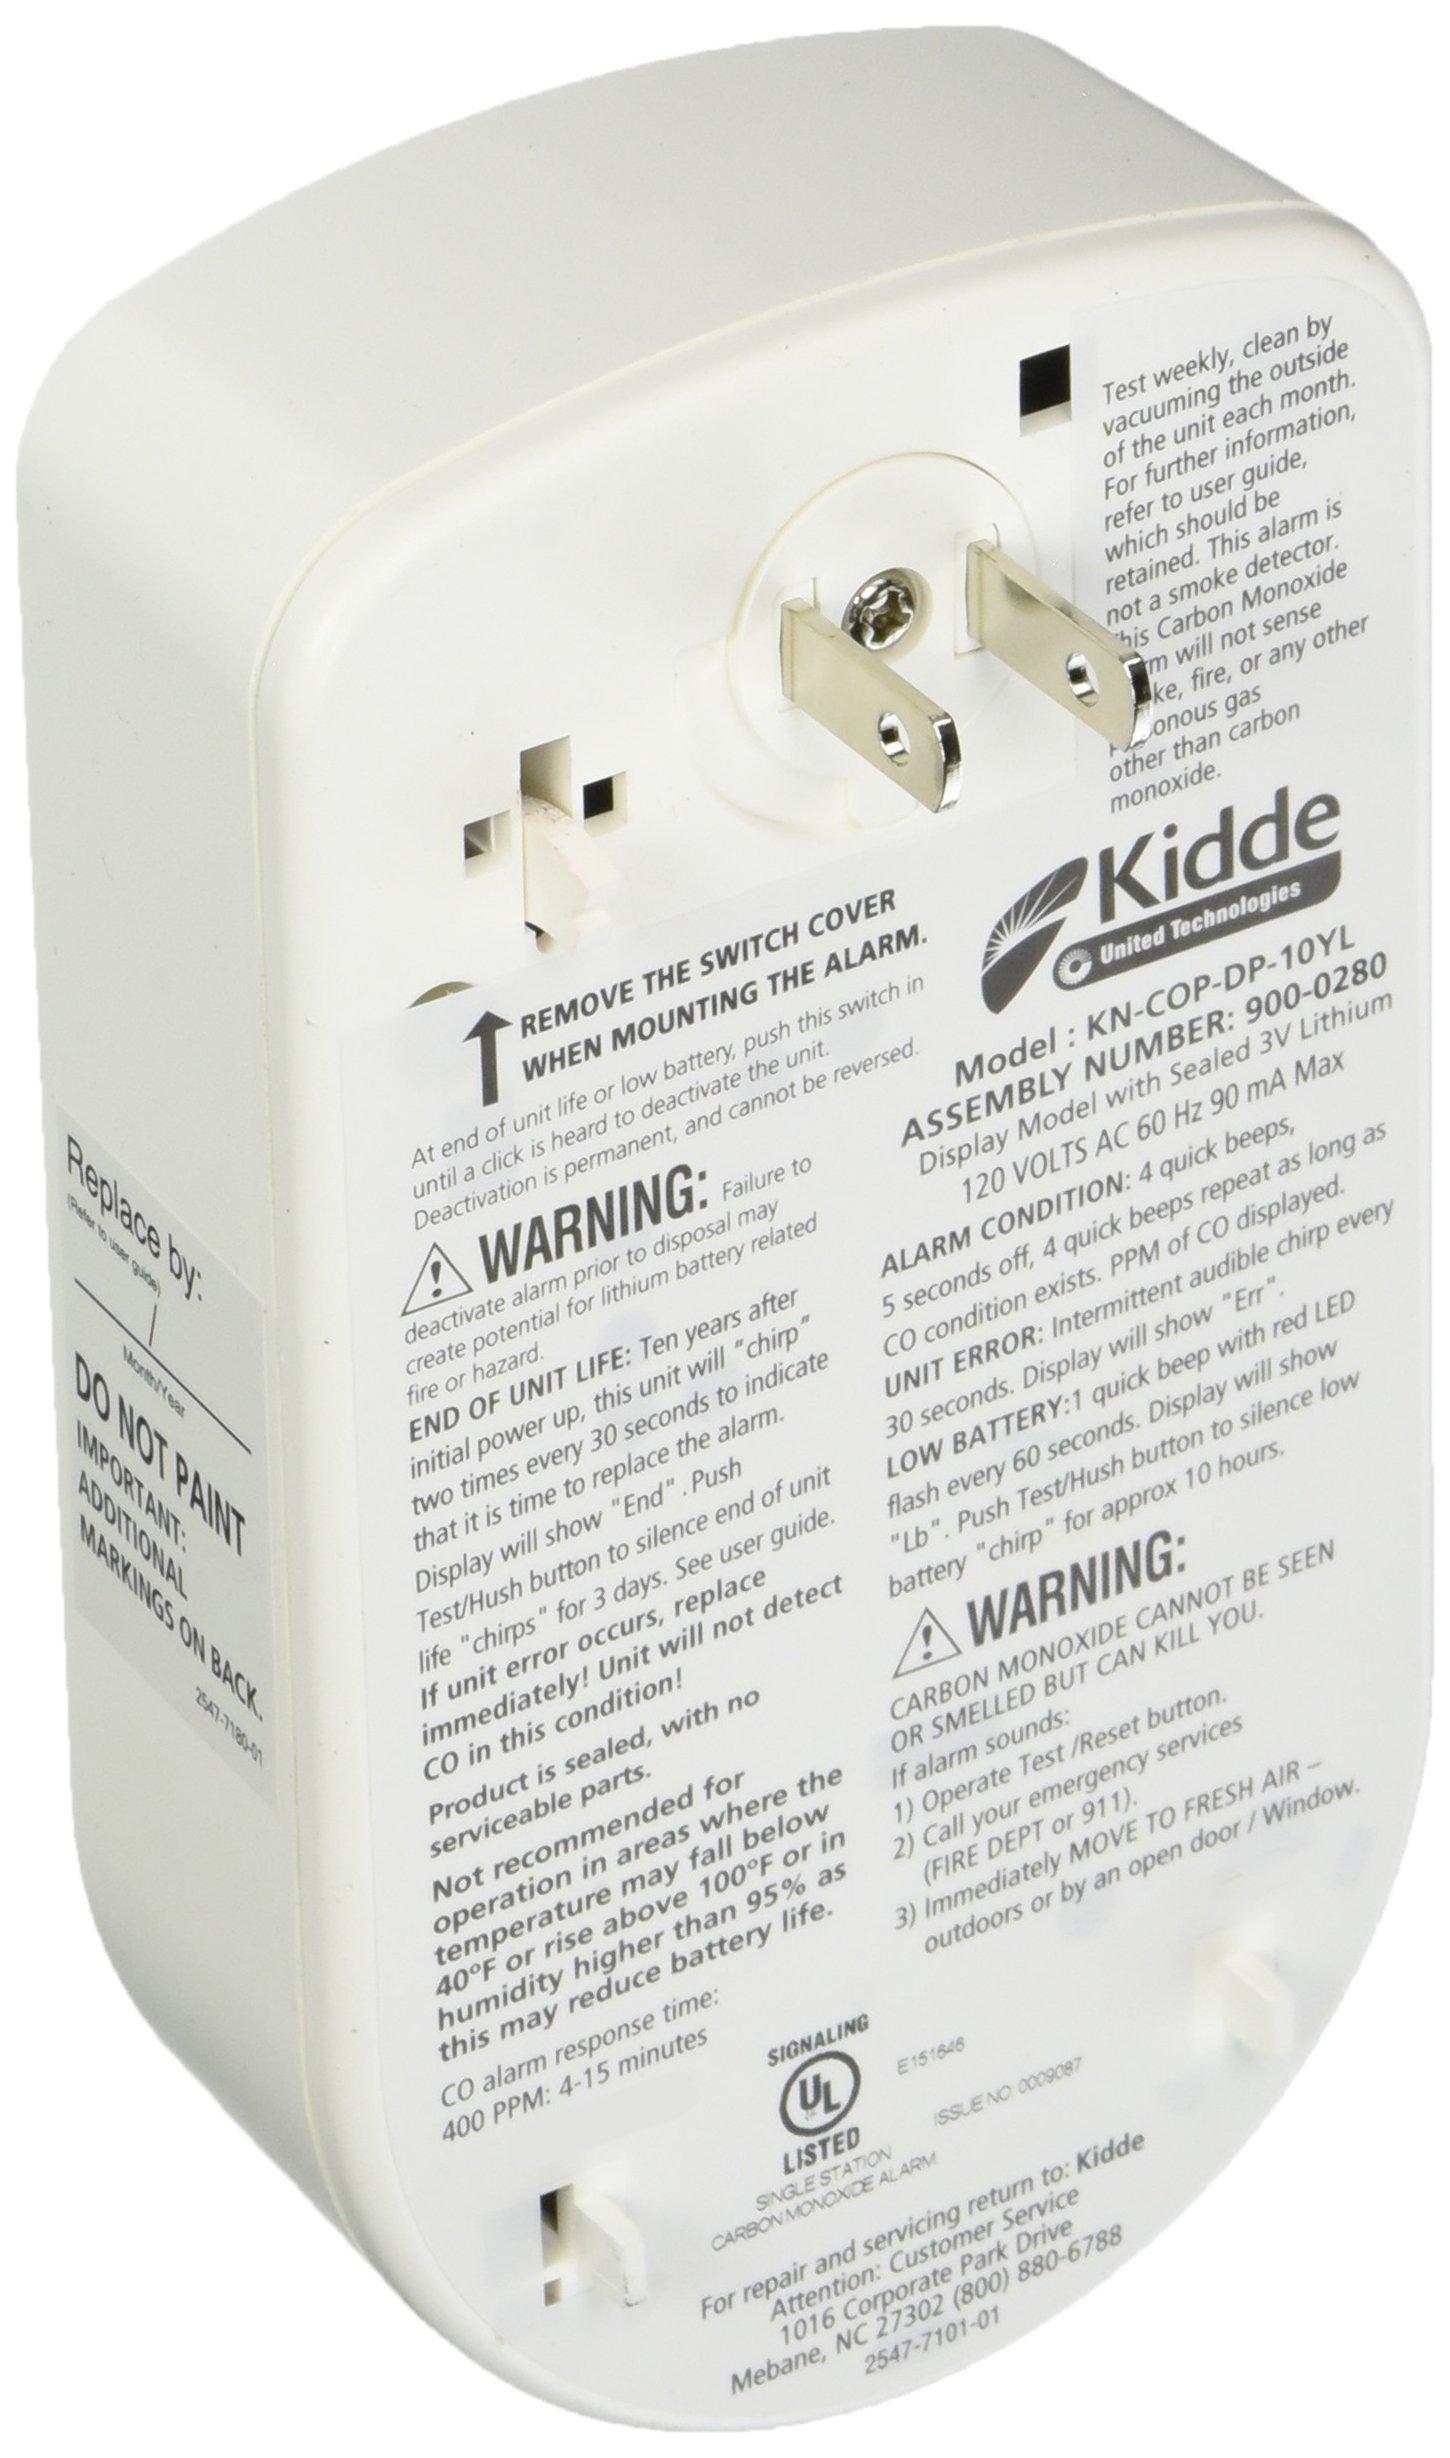 KIDDE 21026350 Plug In Carbon Monoxide Alarm with Sealed Lithium Battery Back Up by Kidde (Image #1)